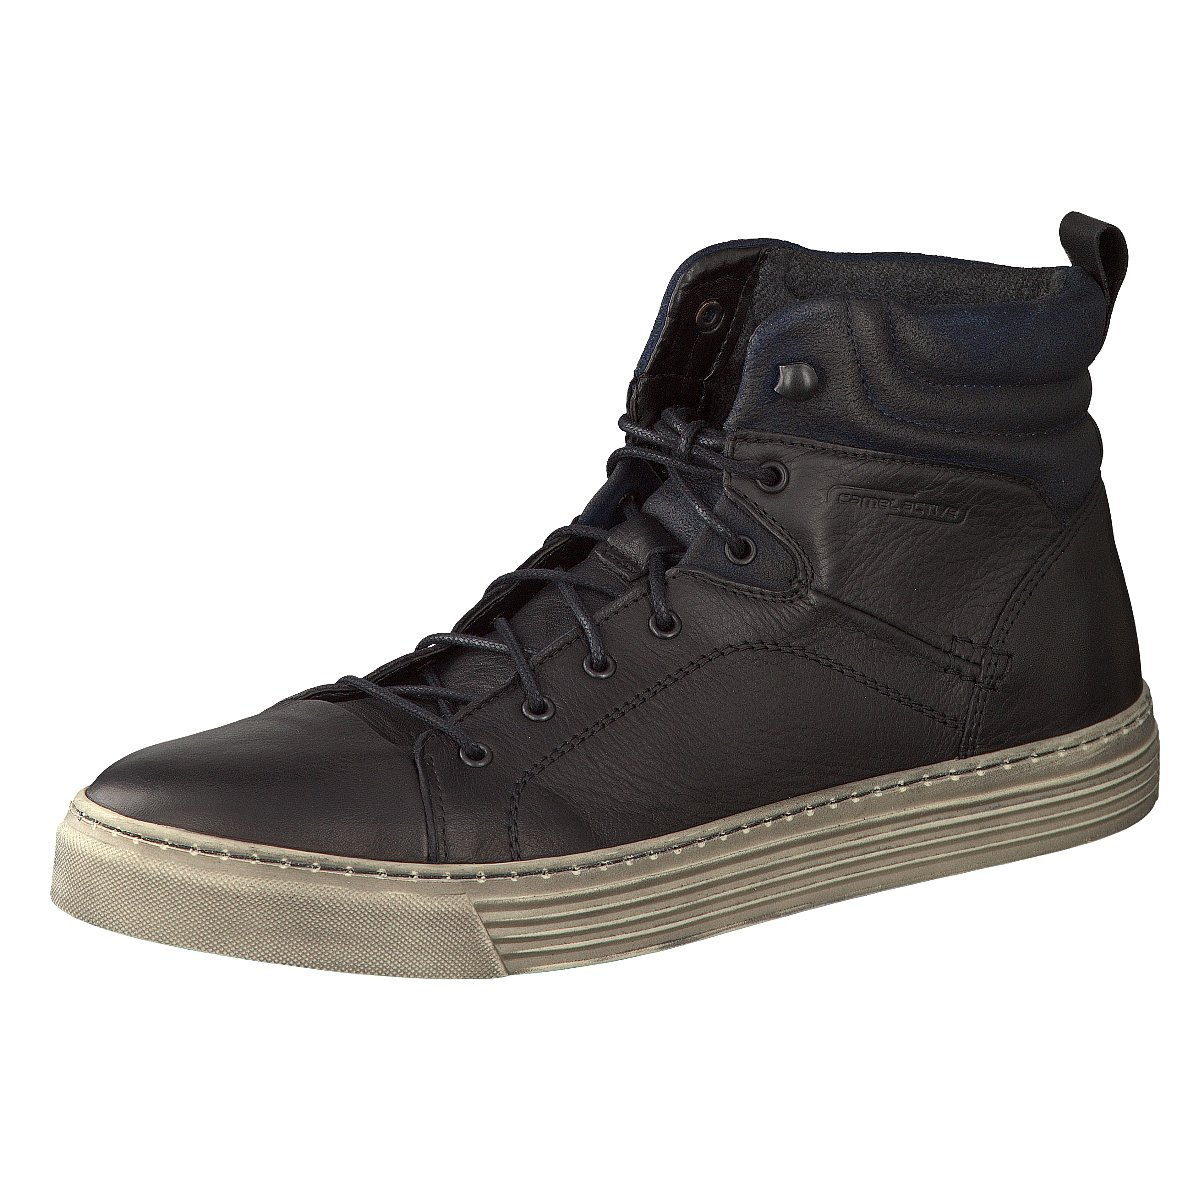 NEU camel active Herren Sneaker Bowl 429.12.02 schwarz 146127